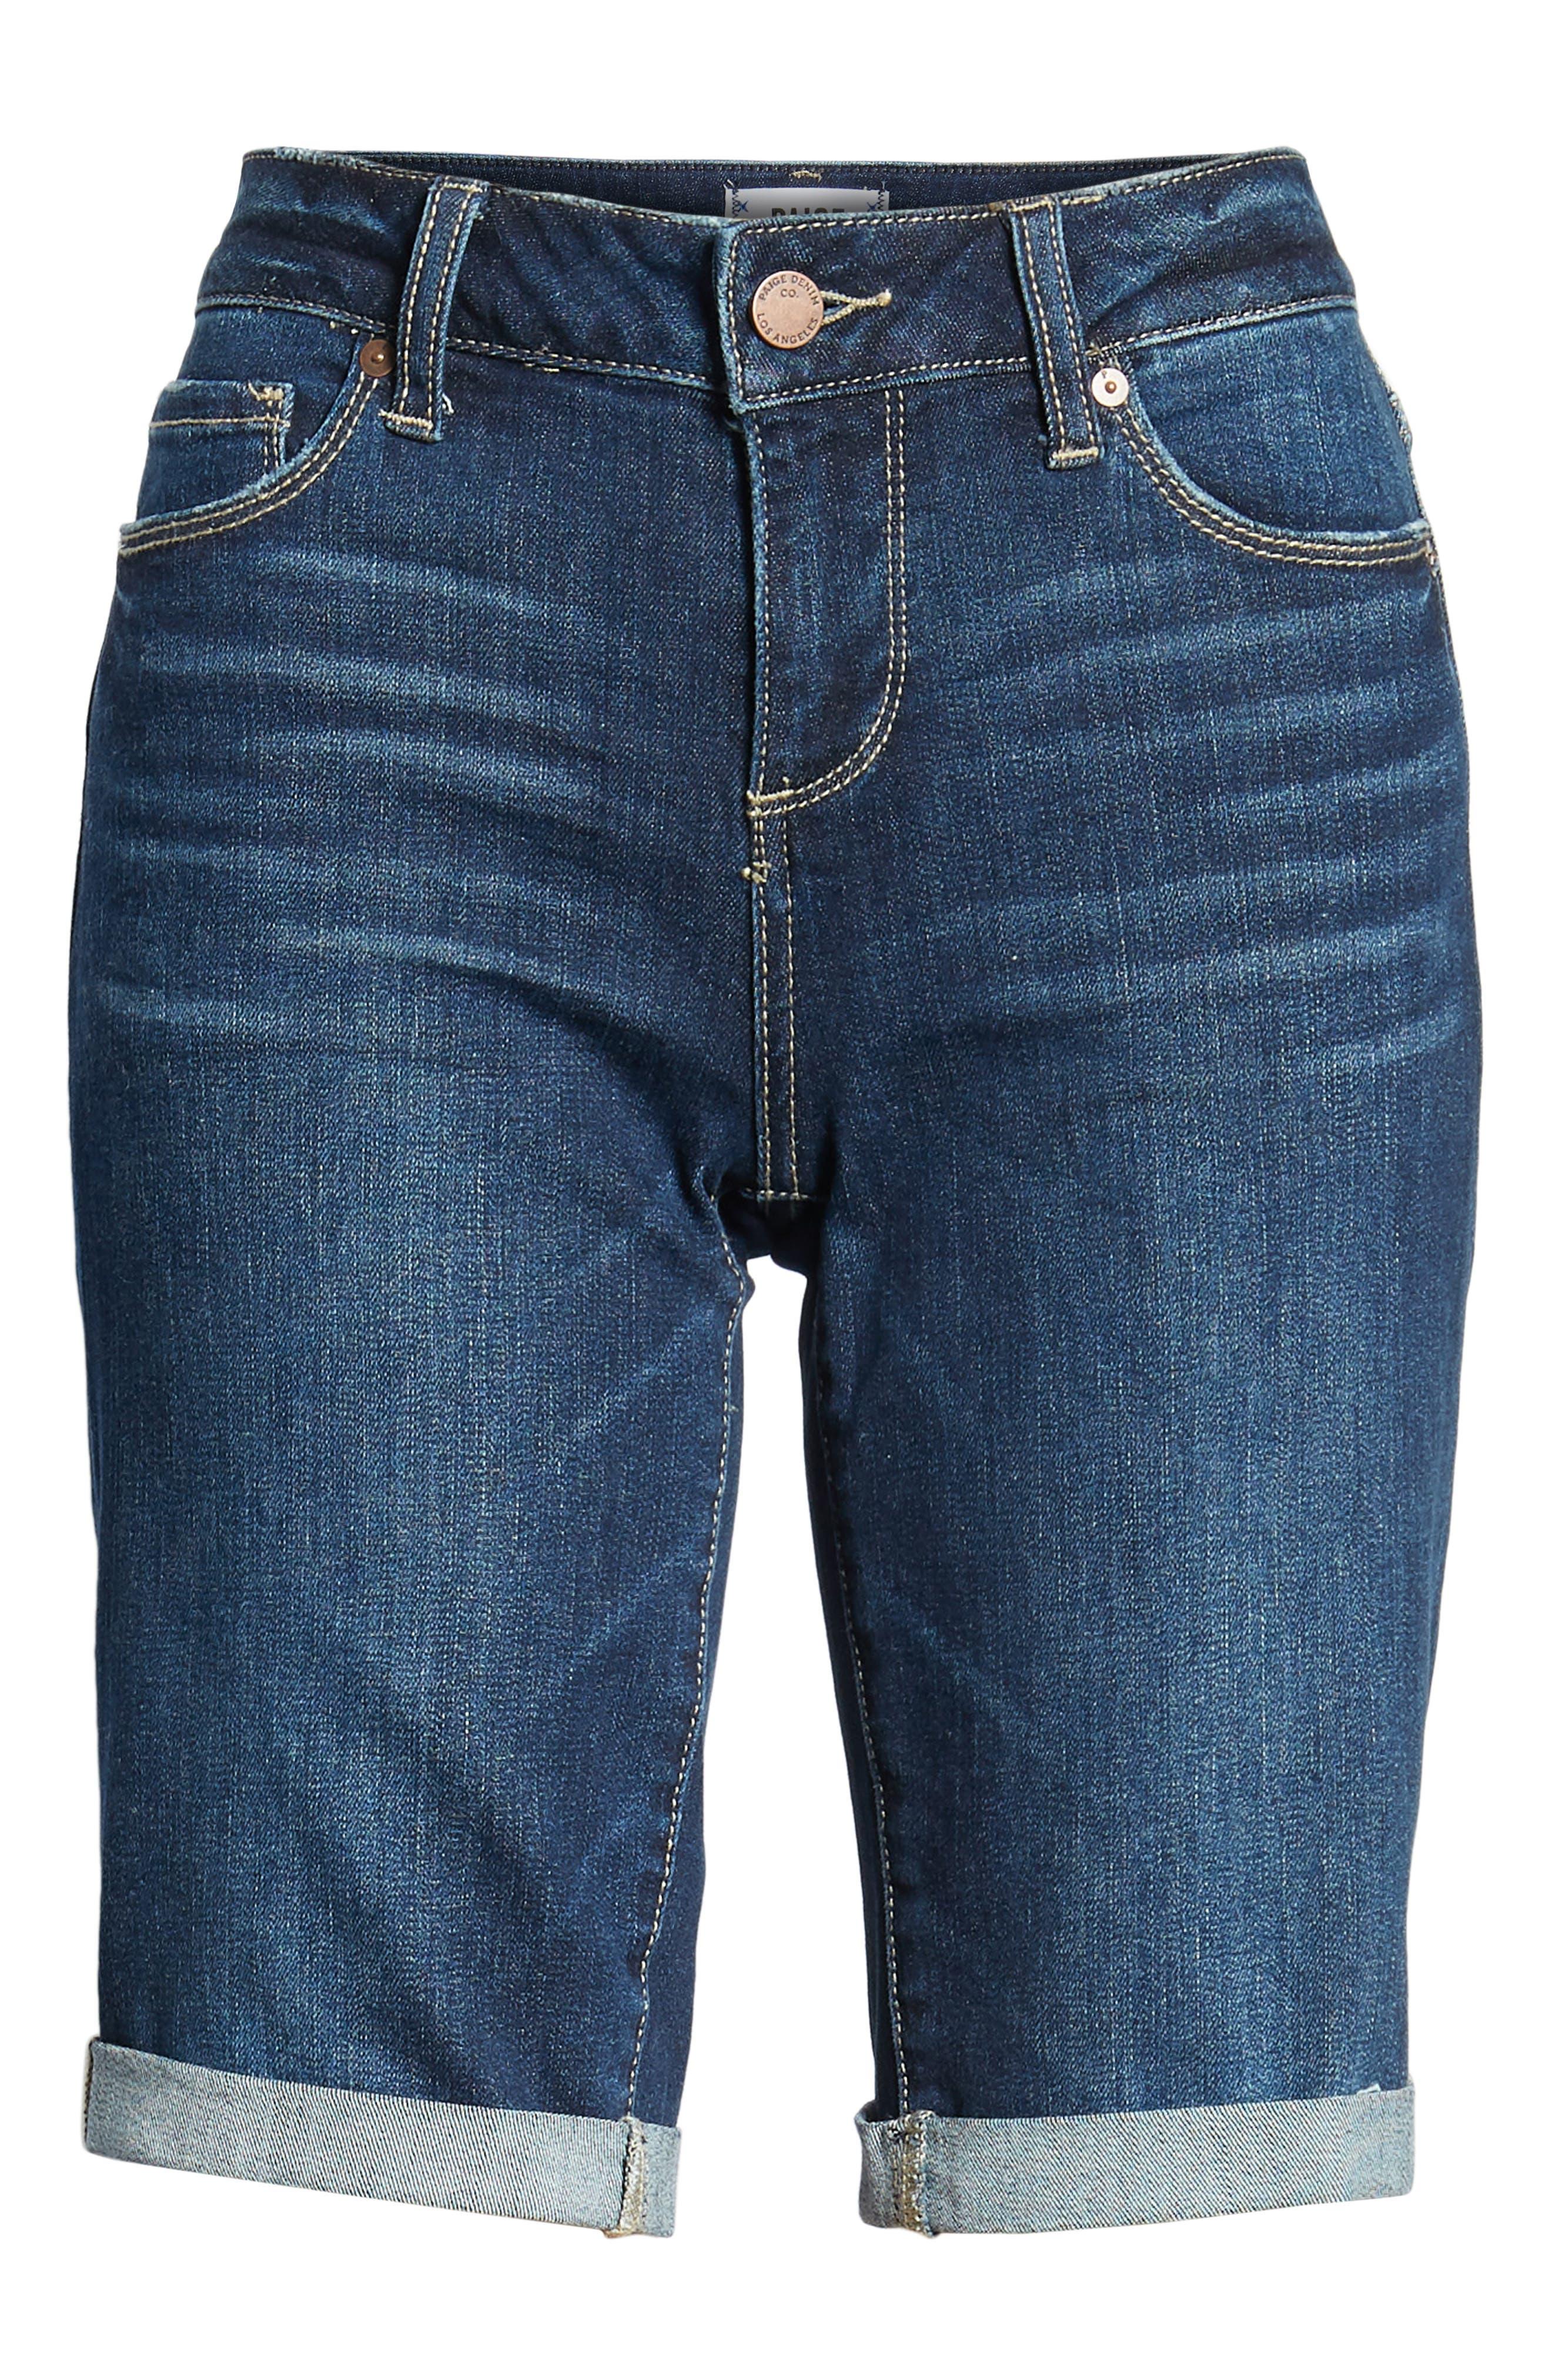 Transcend Vintage - Jax Denim Bermuda Shorts,                             Alternate thumbnail 7, color,                             400